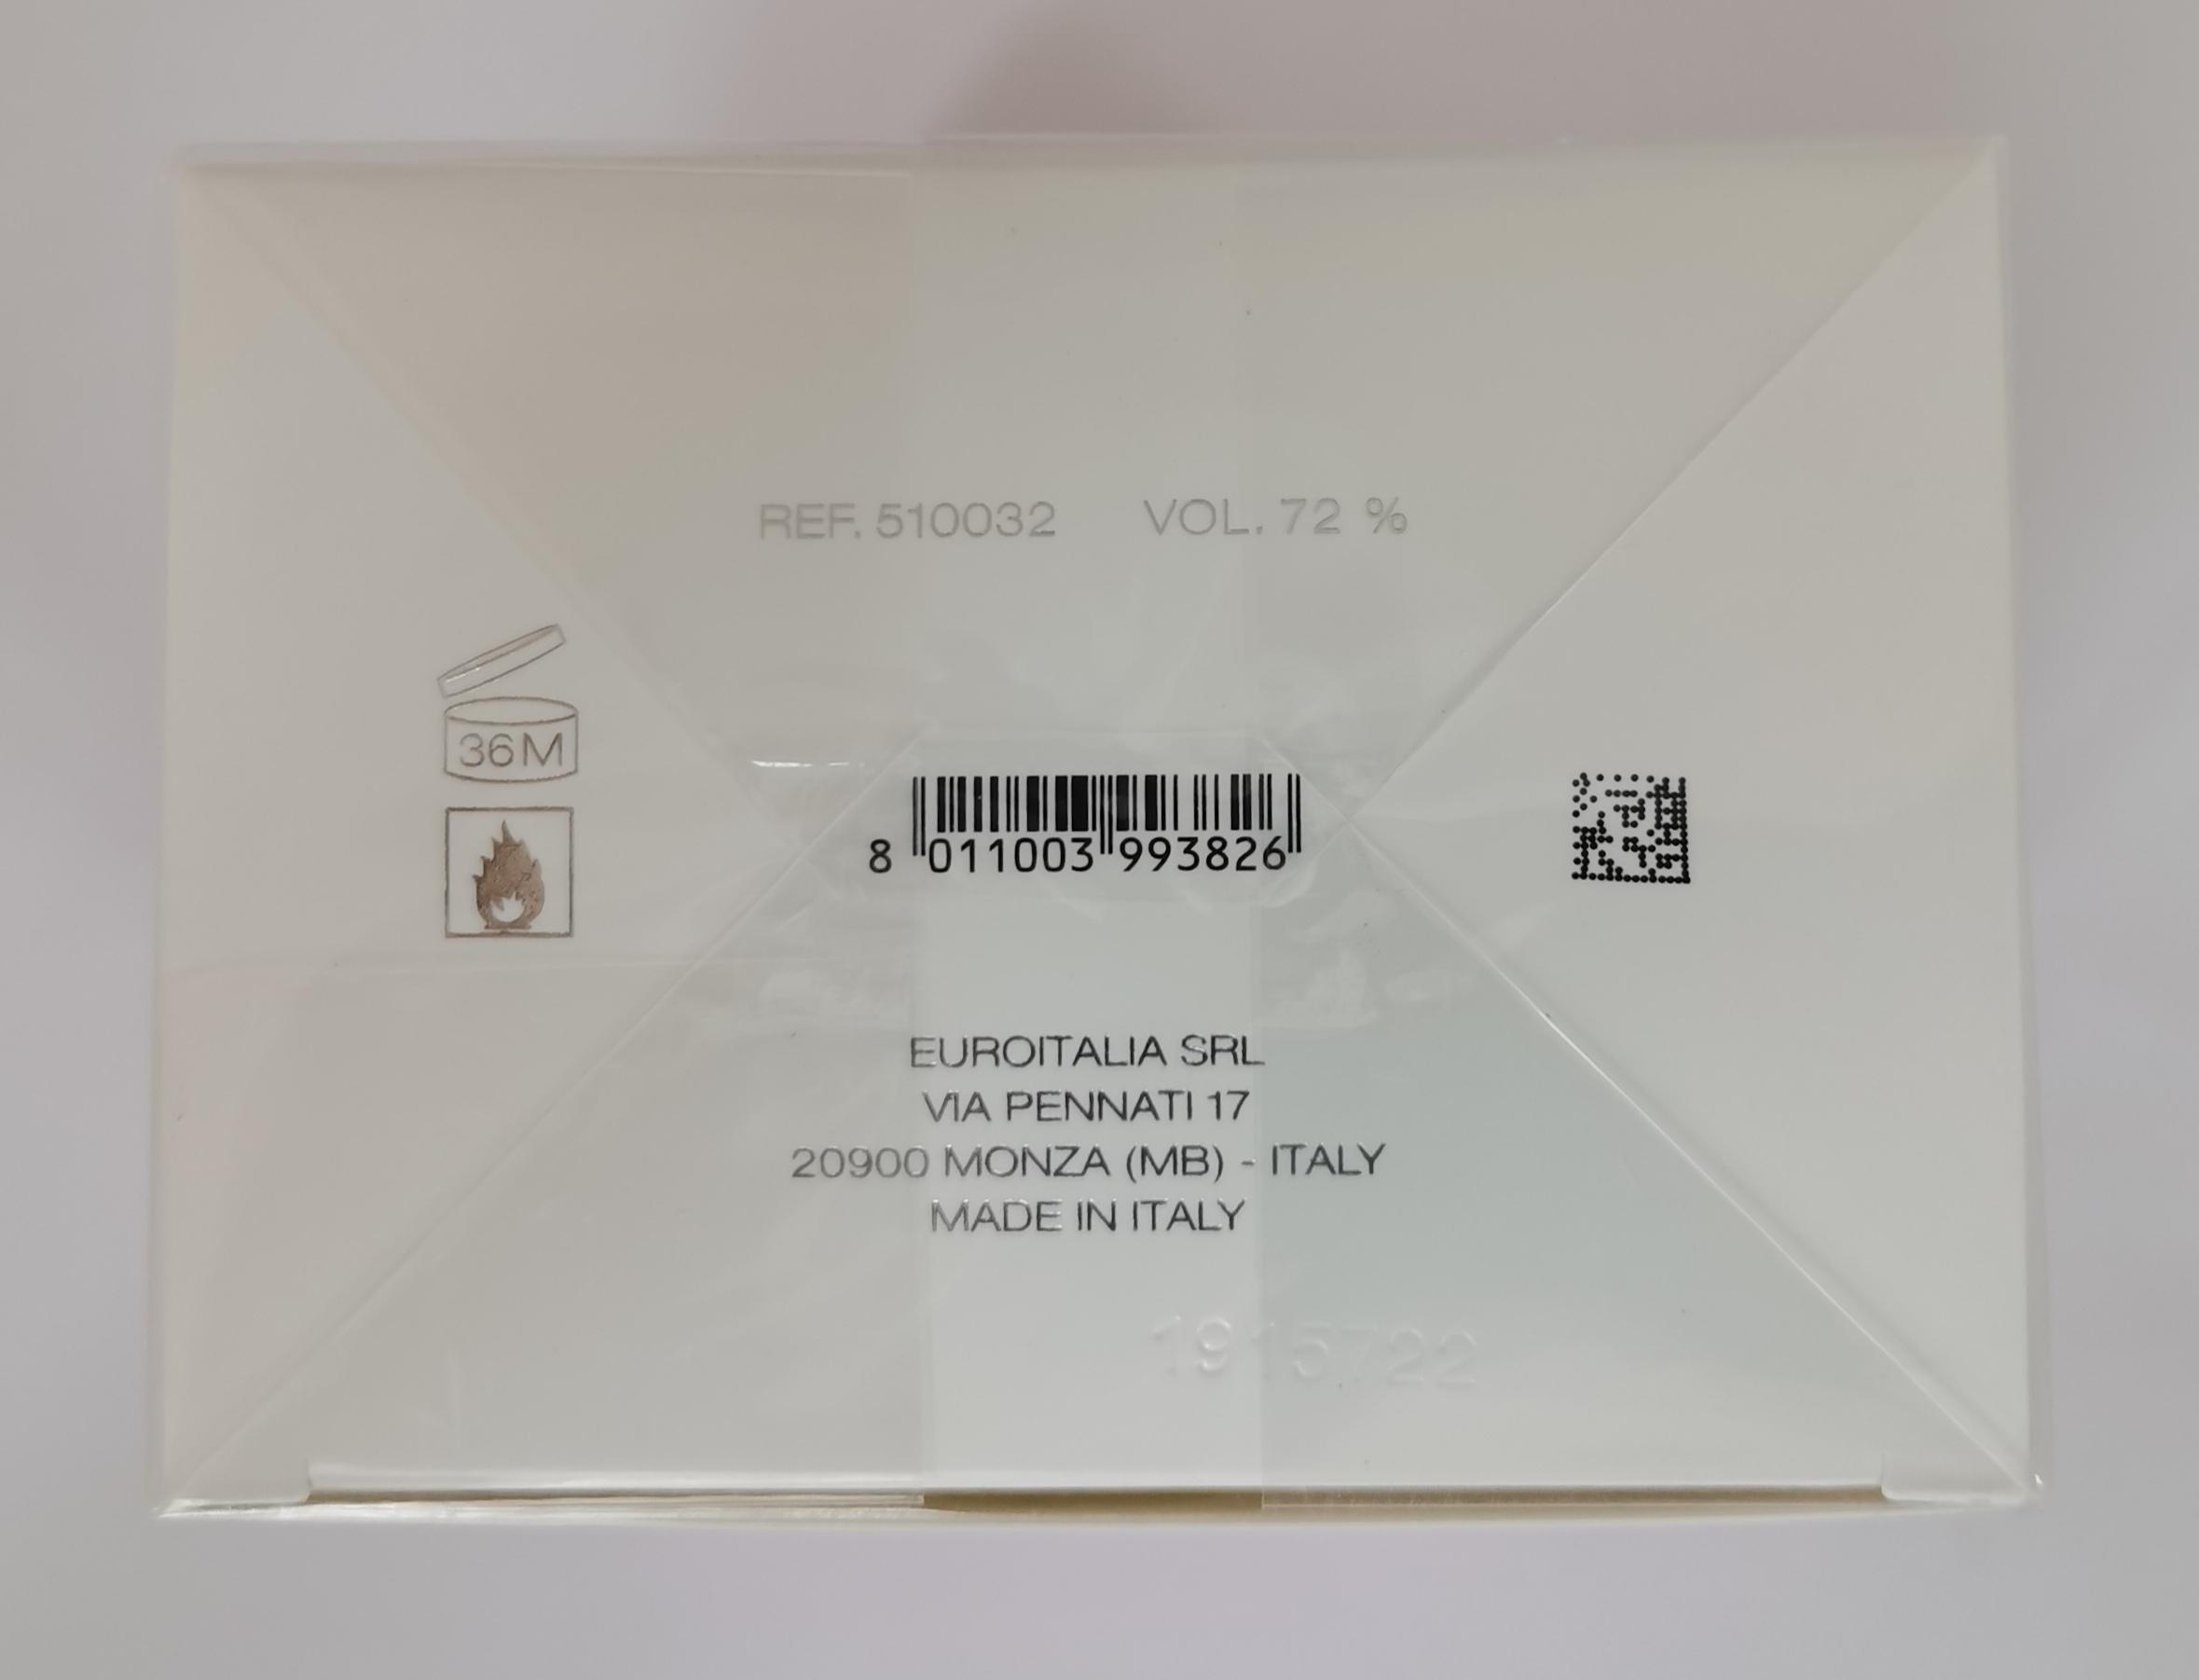 Туалетная вода 90 мл Versace Bright Crystal - фото штрих-кода и батч-кода на коробке